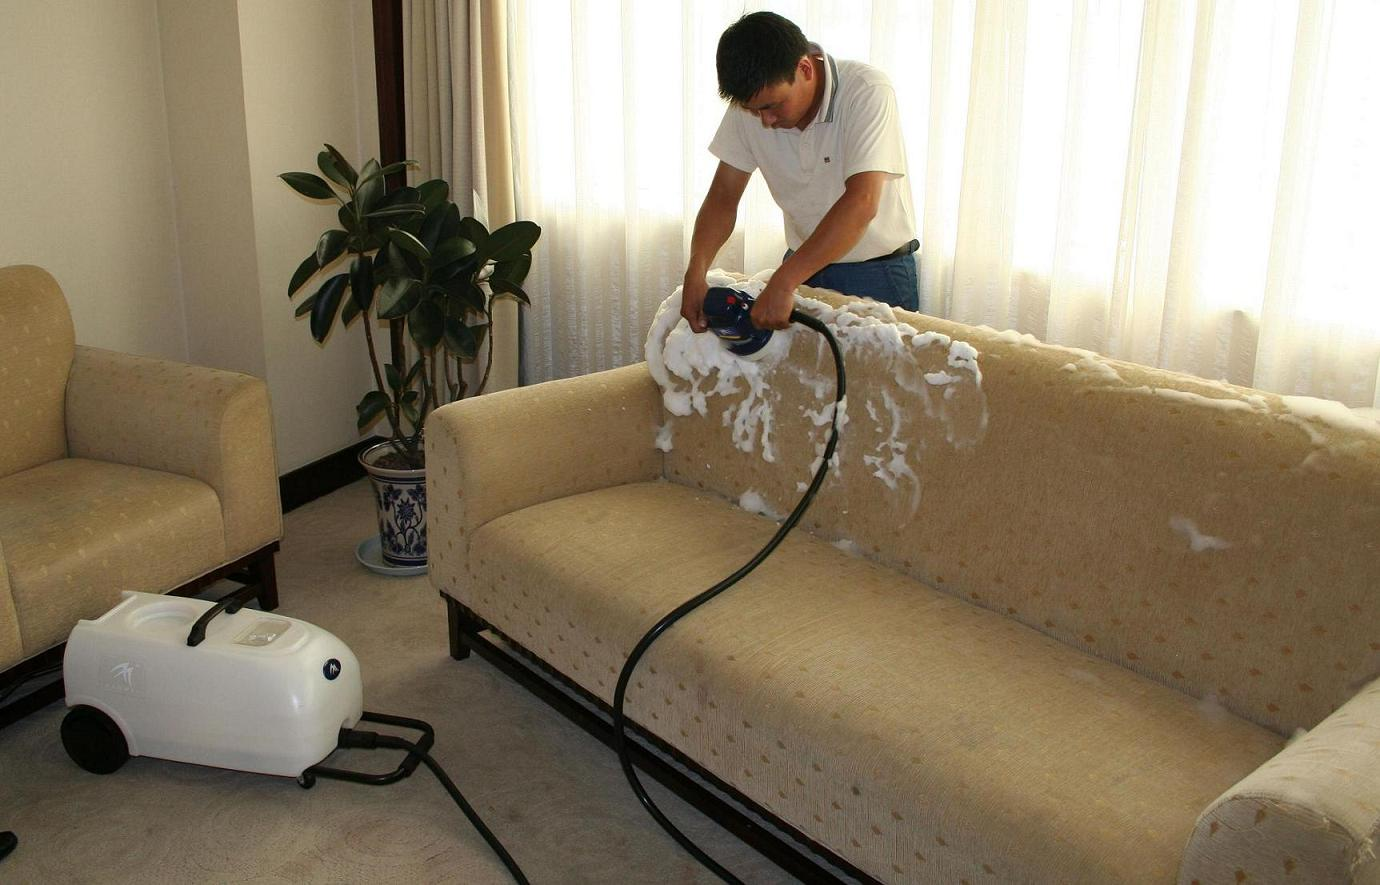 Как почистить диван в домашних условиях от грязи и запаха 16